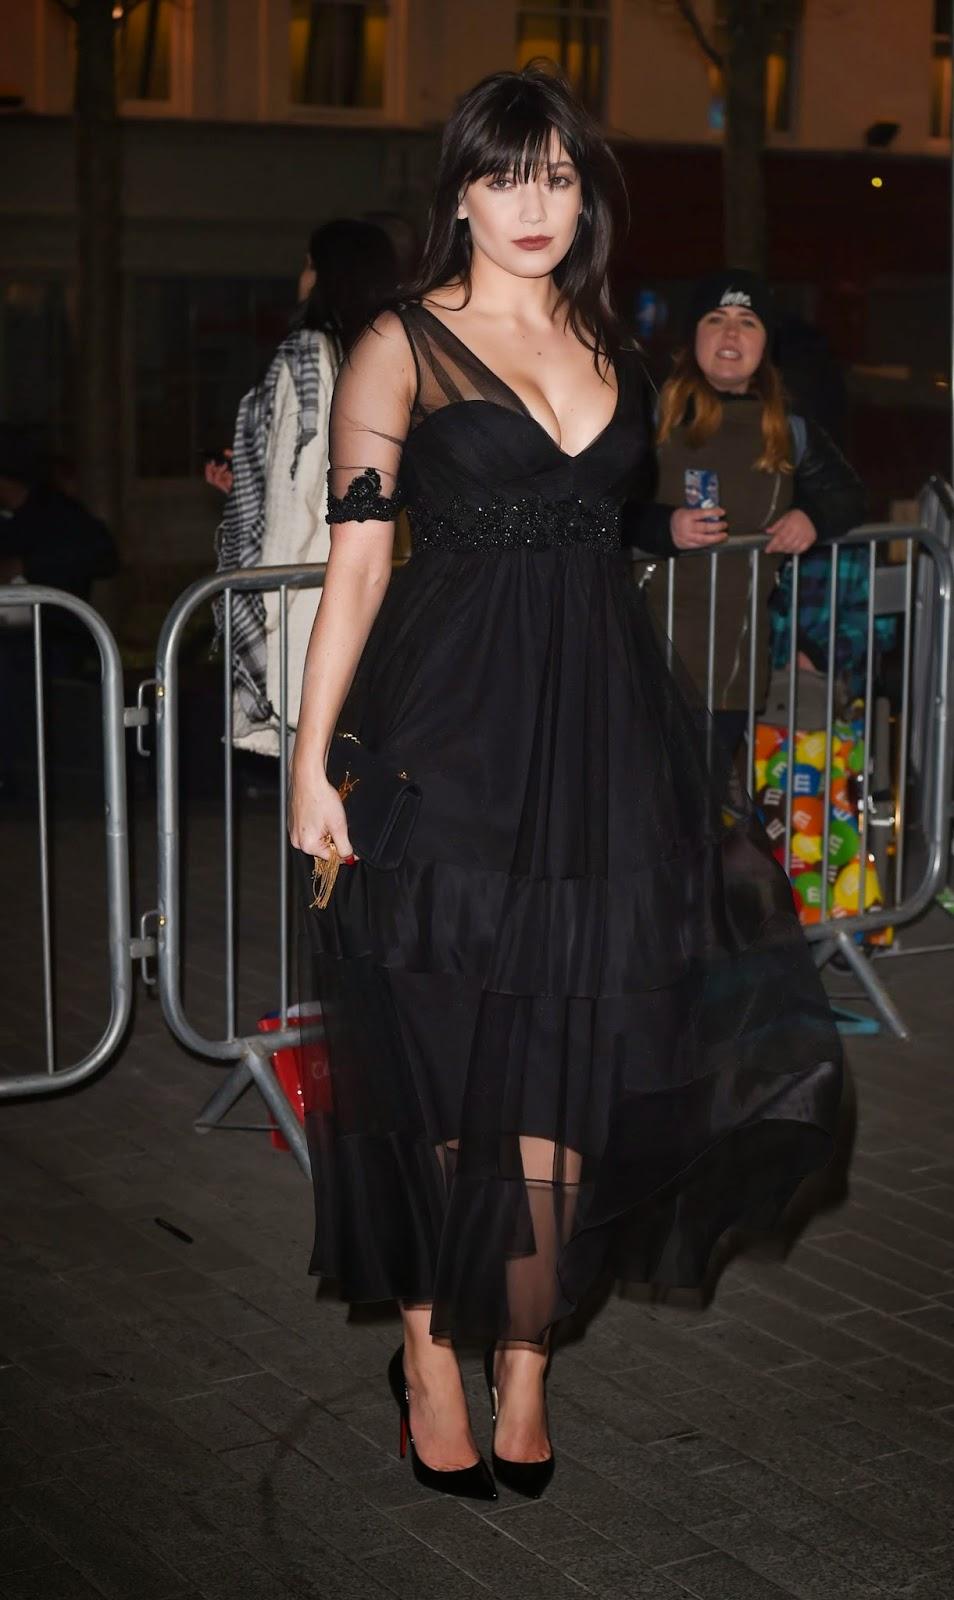 Arts Cross Stitch Fashion Model Actress Singer Daisy Lowe Elle Style Awards 2015 In London